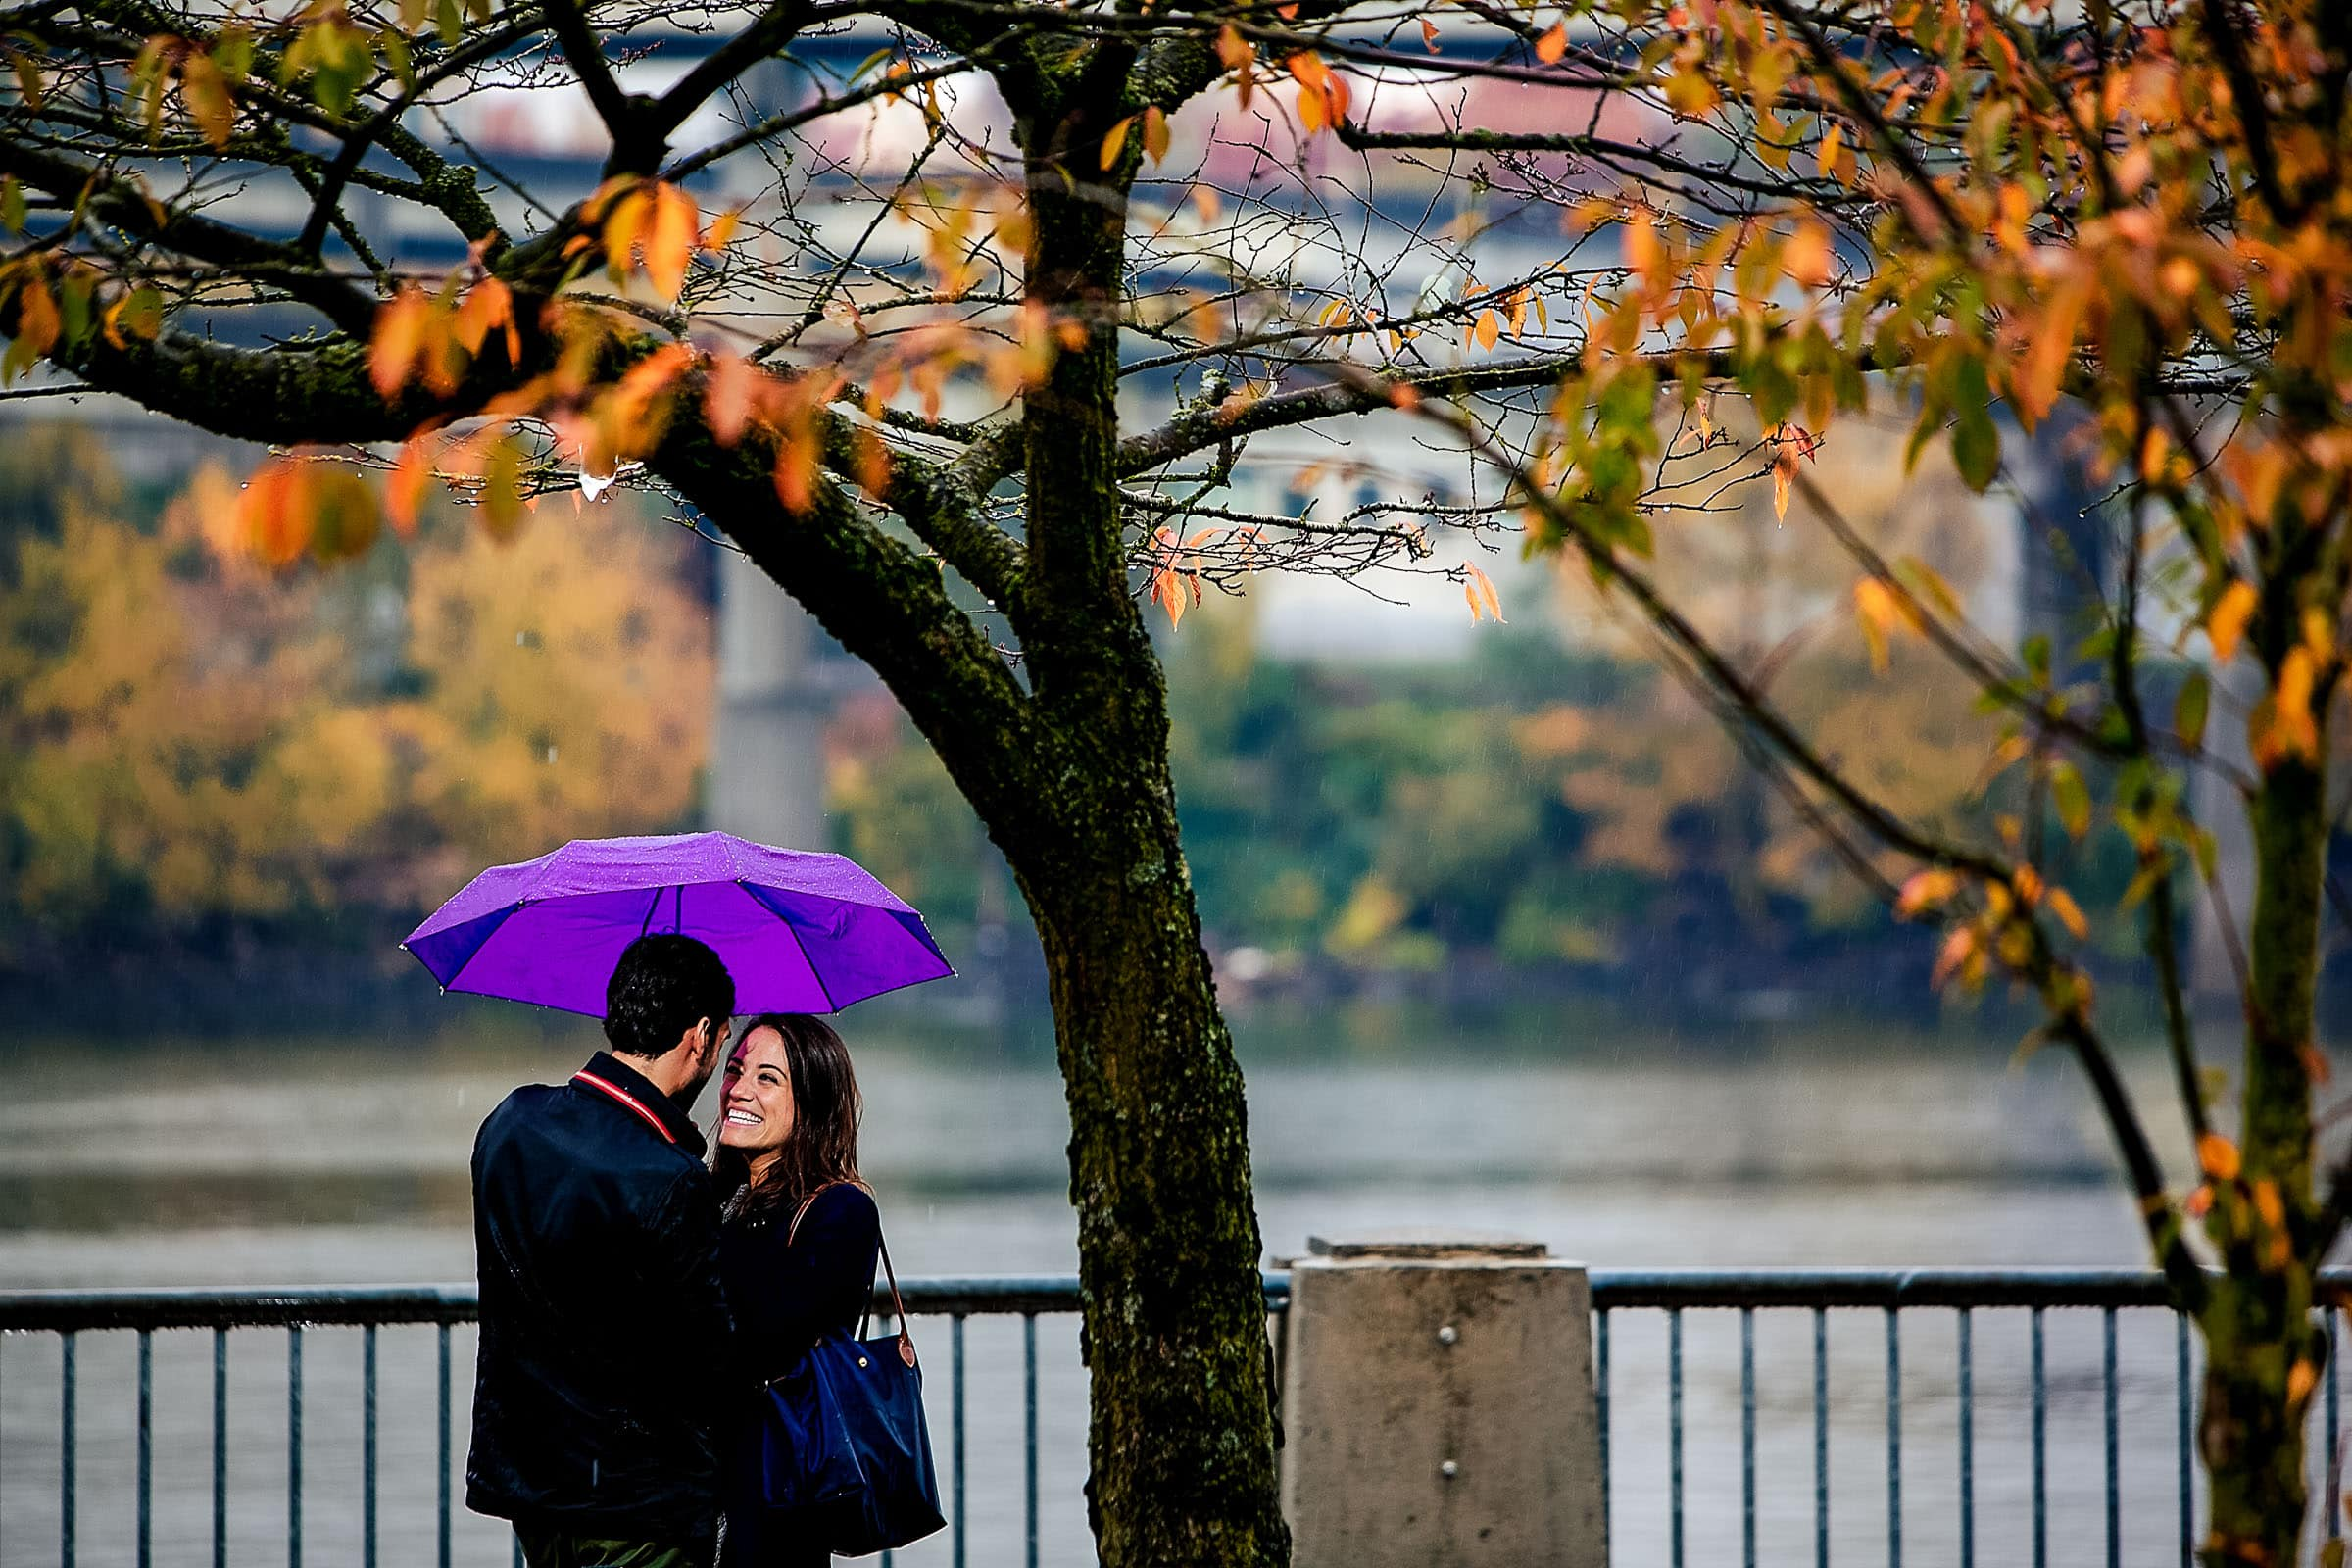 A surprise Portland engagement proposal on the Portland waterfront park